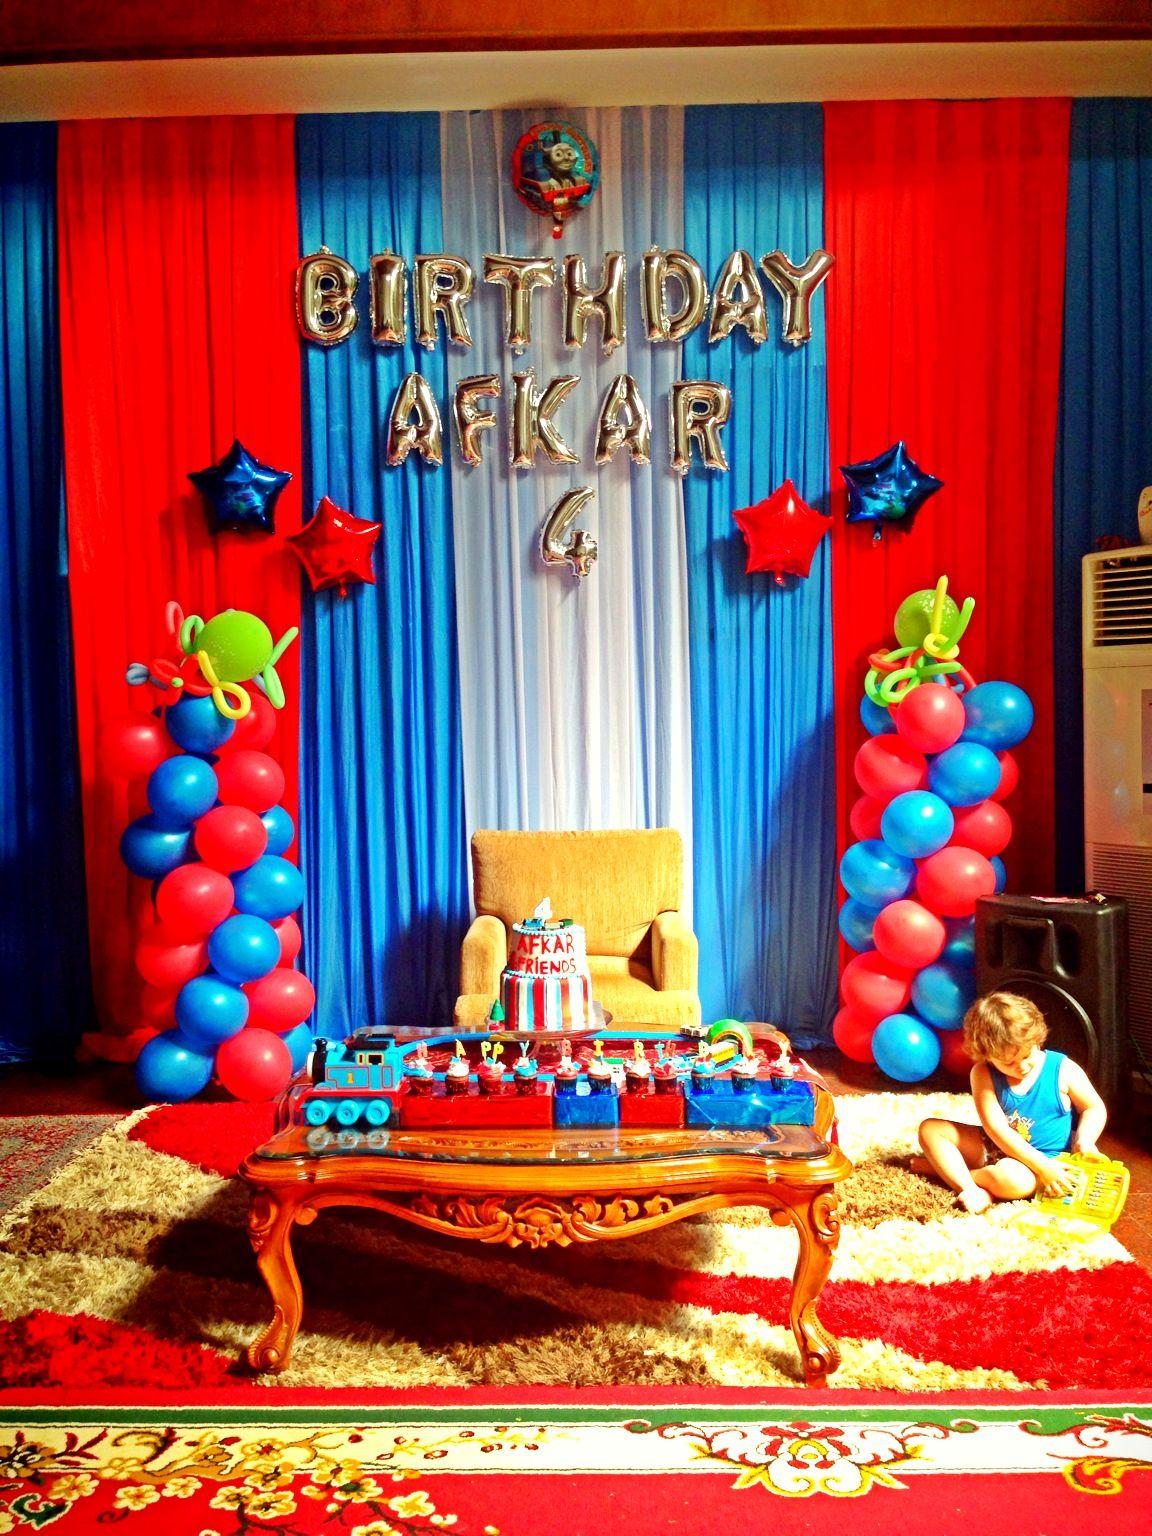 Thomas and friends birthday party Birthday Afkar 4th